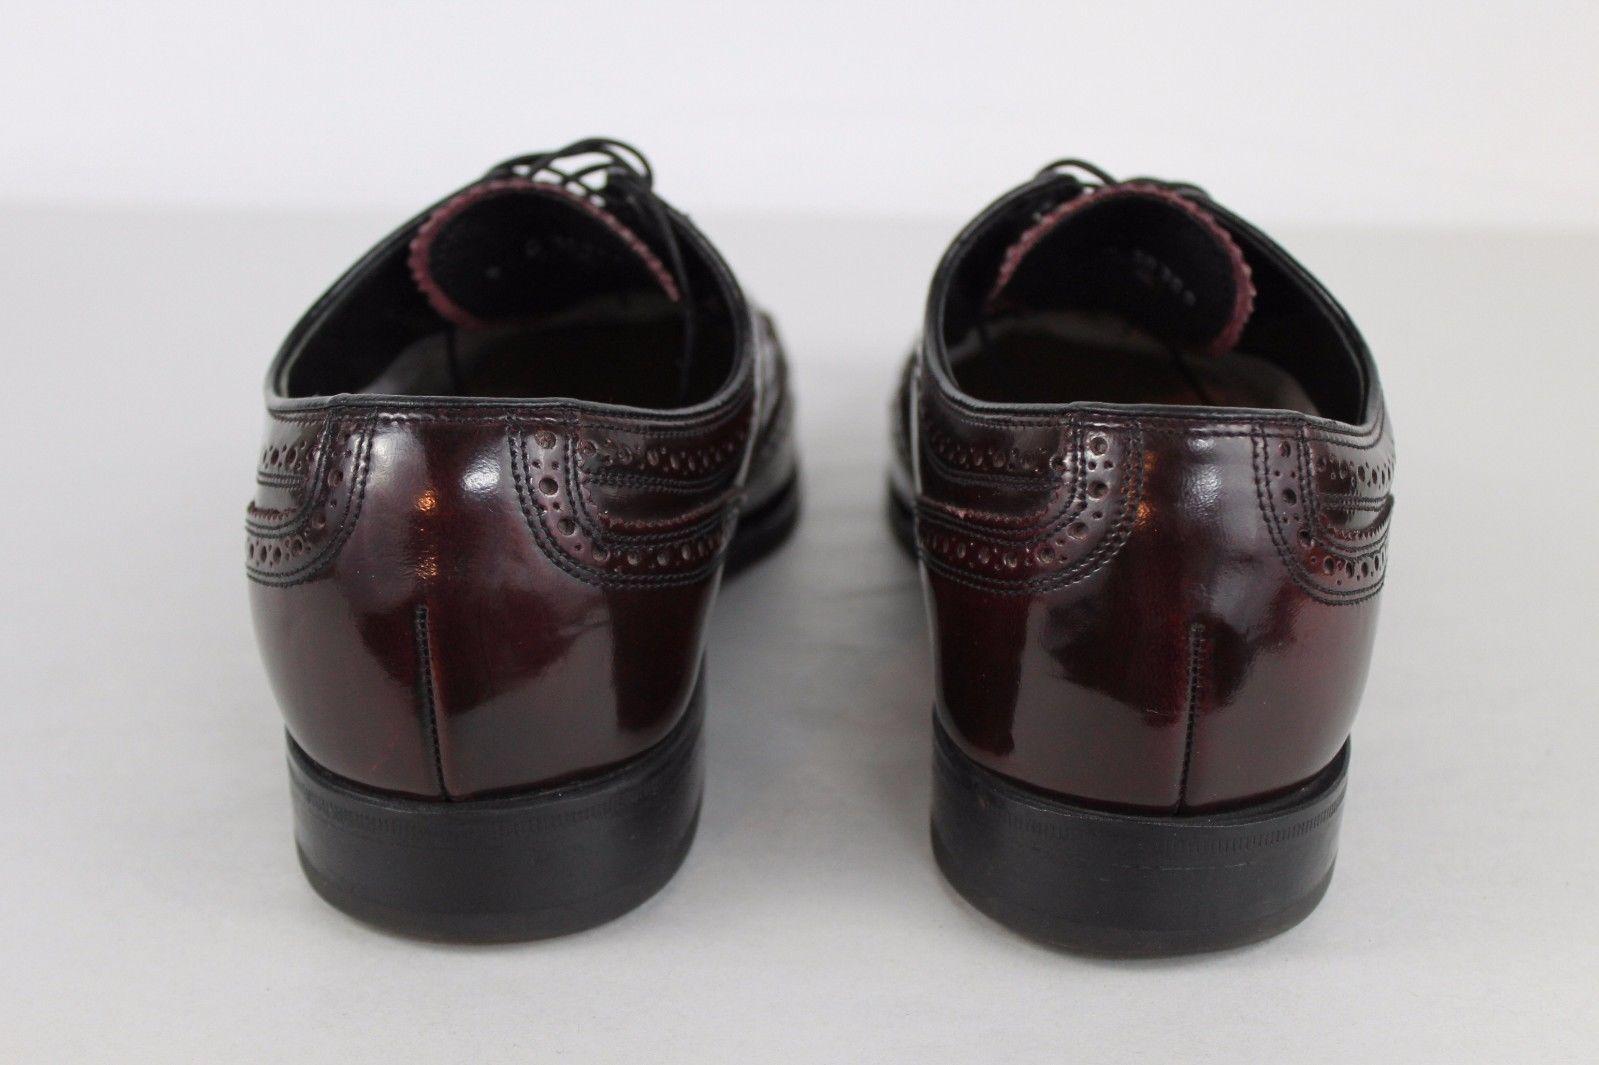 Florsheim Burgundy  Wingtip Dress D Shoes Pelle Uomo Size 9 D Dress Model 30300 36b2cd